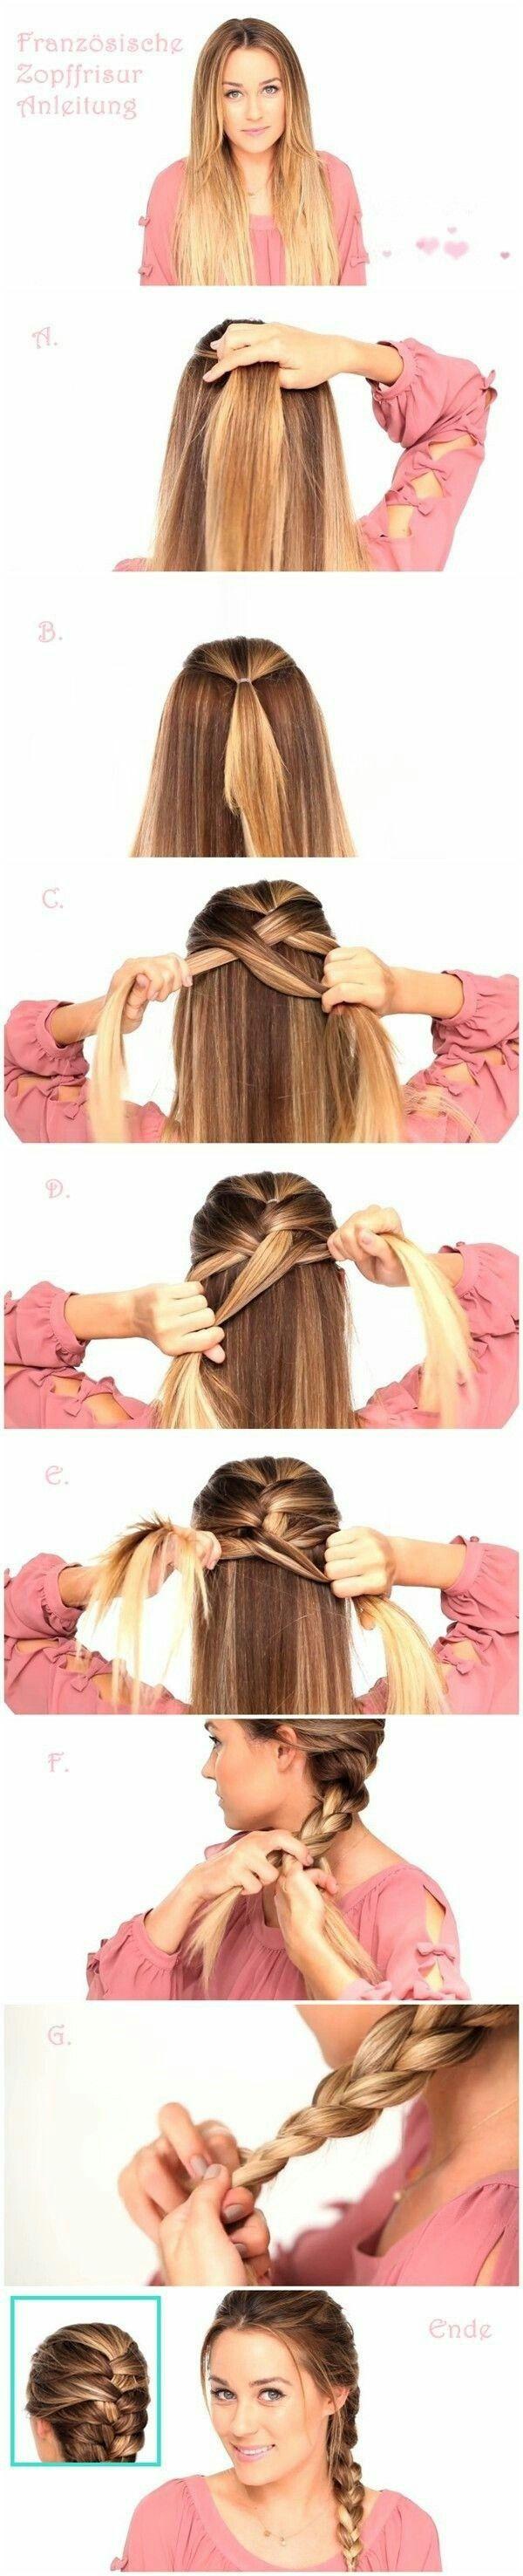 best peinados images on pinterest